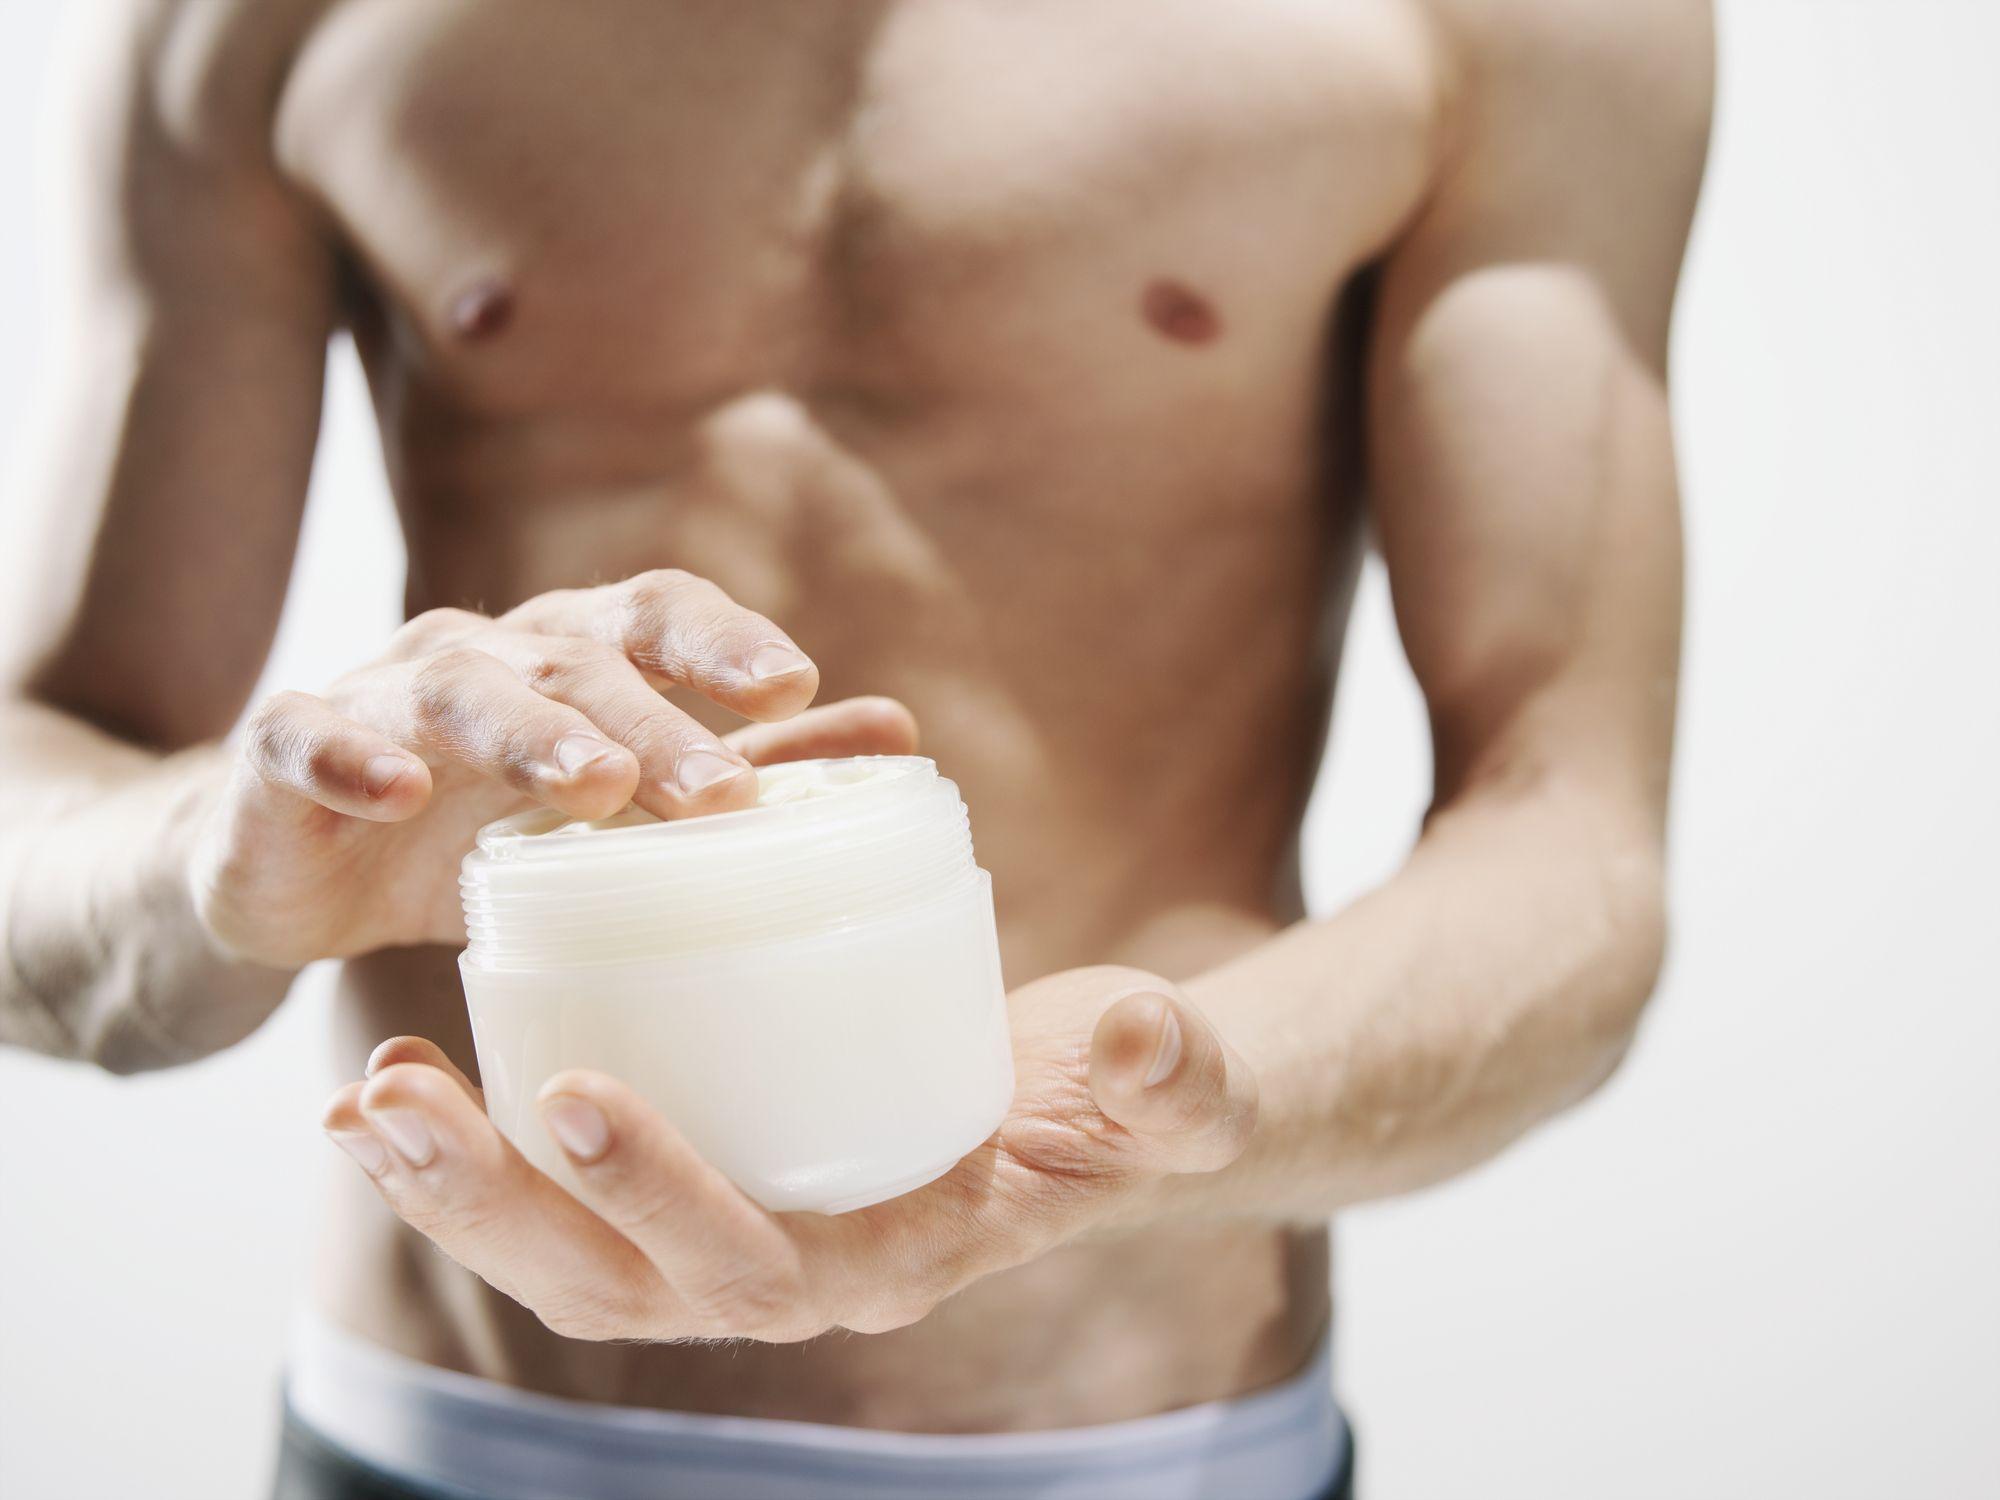 crema reductora abdomen hombre amazon